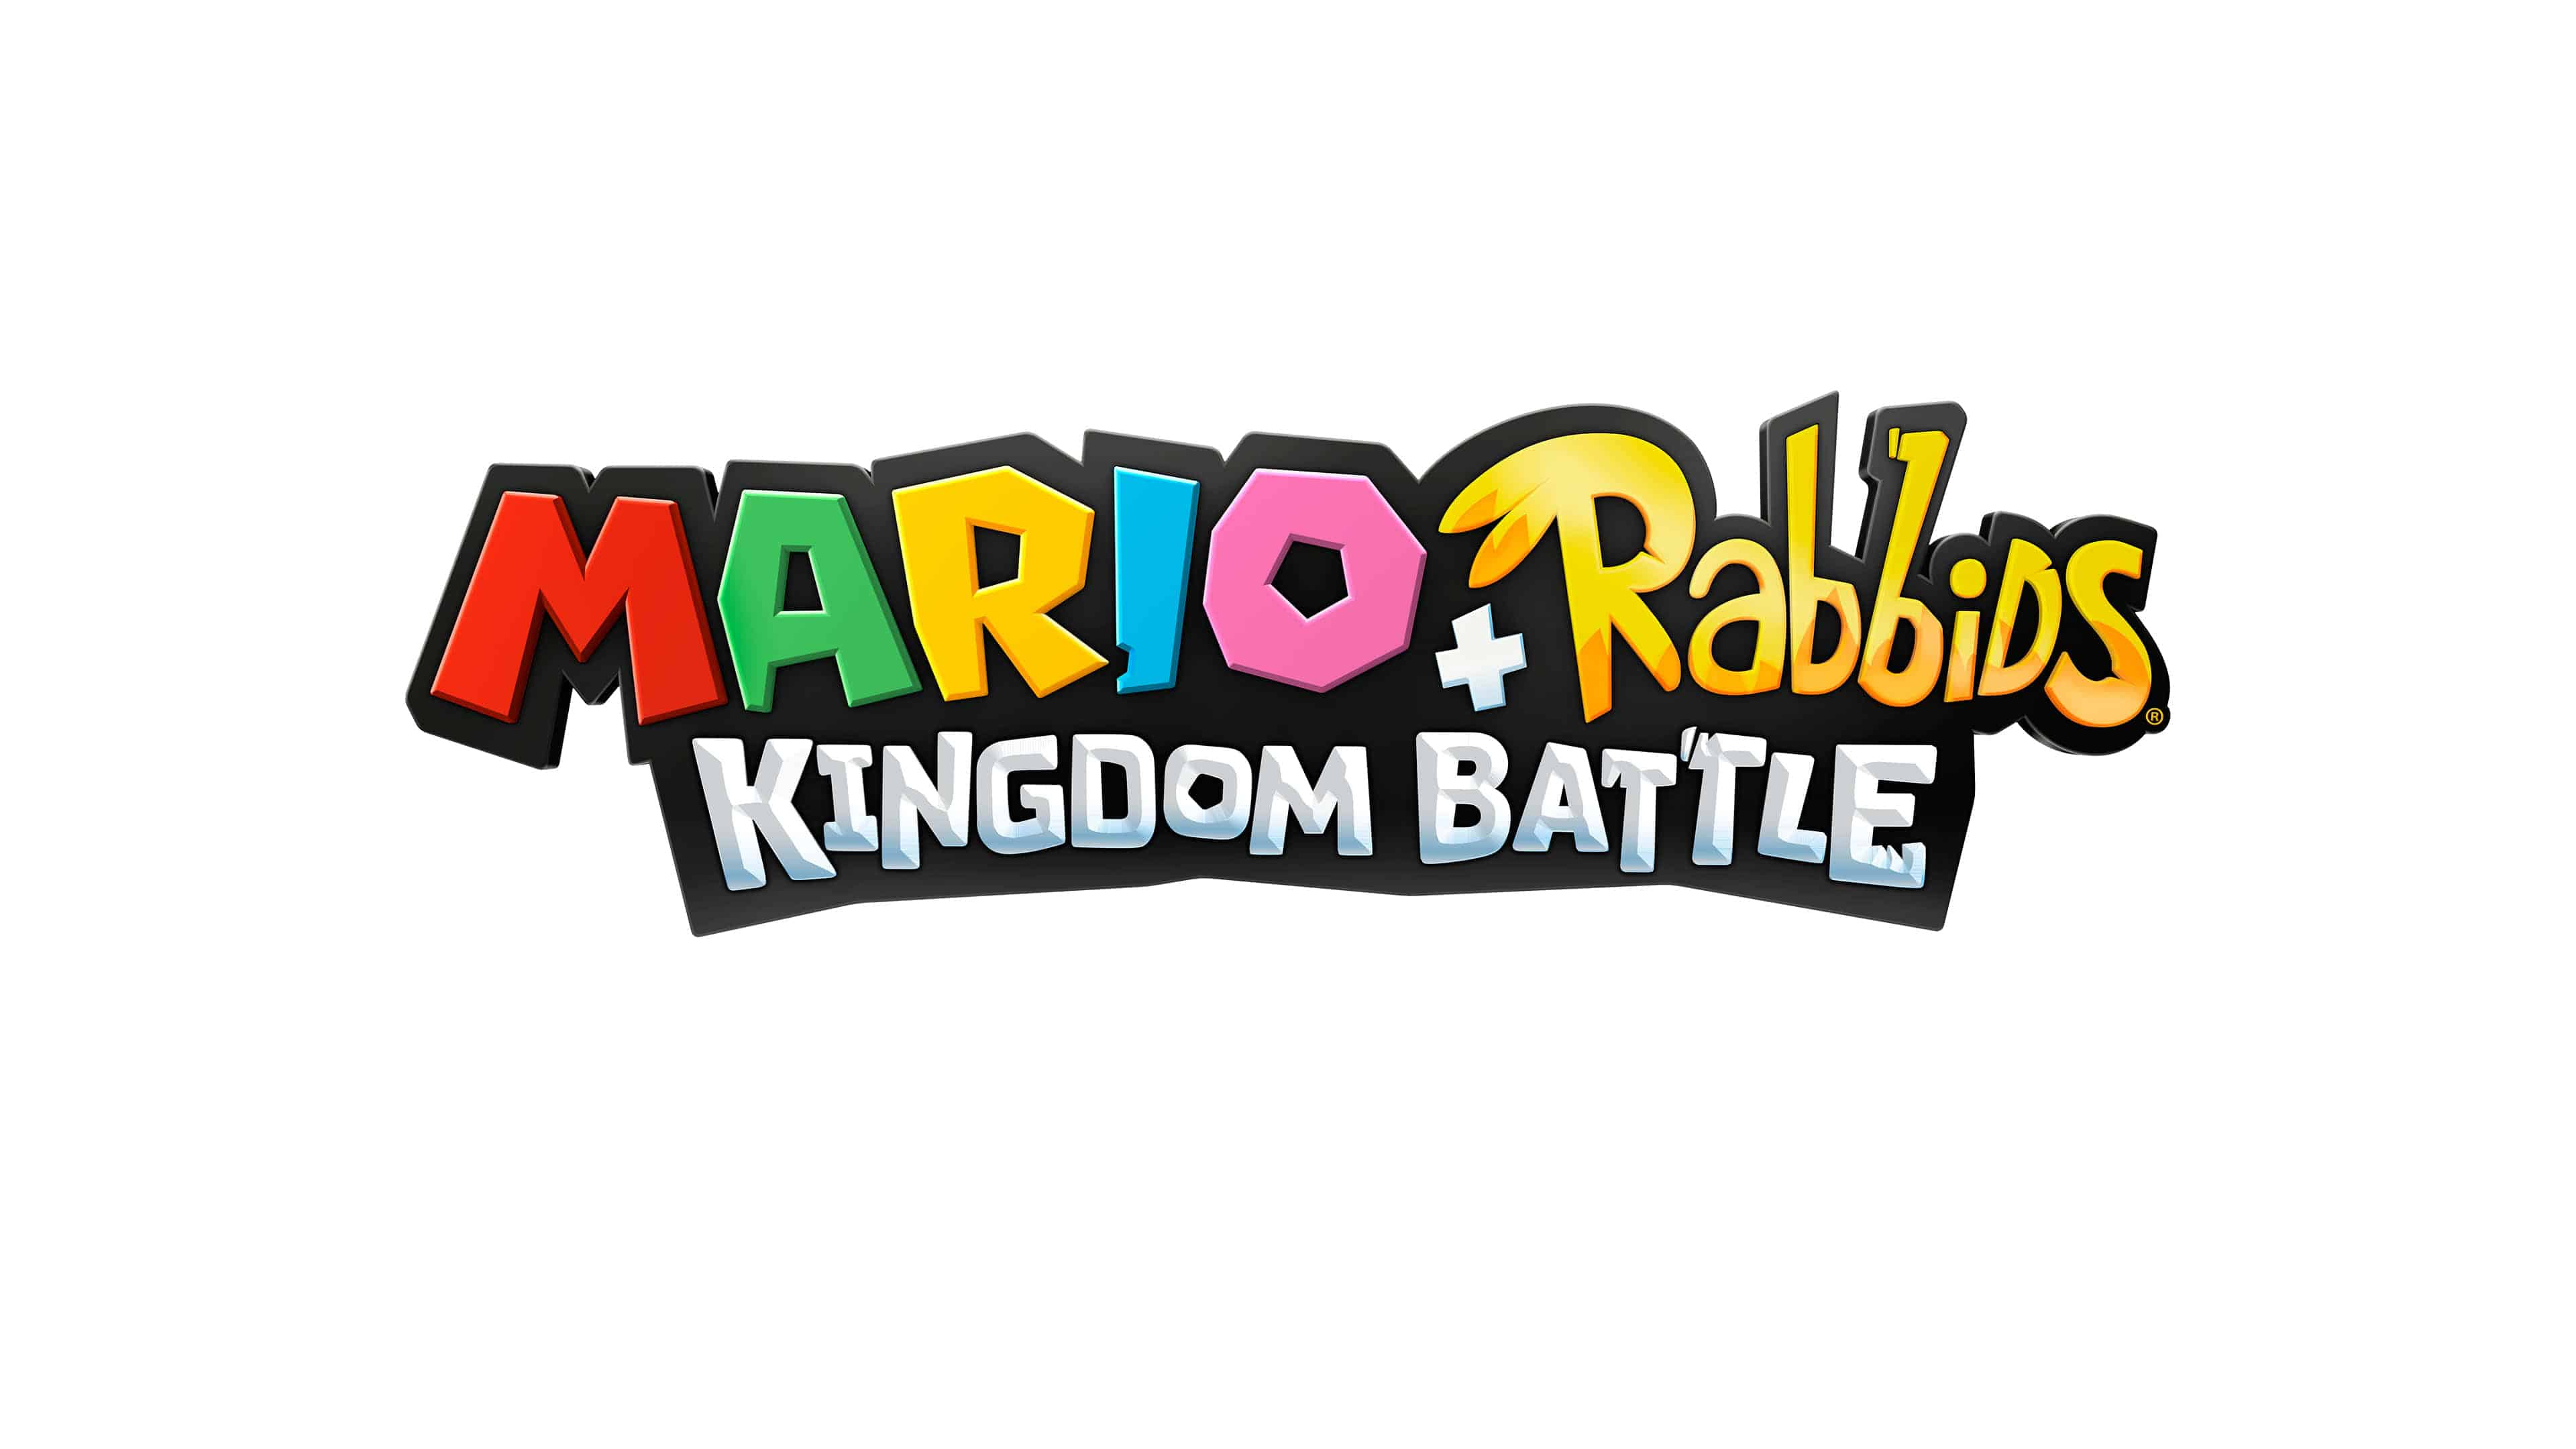 mario rabbids kingdom battle logo uhd 4k wallpaper